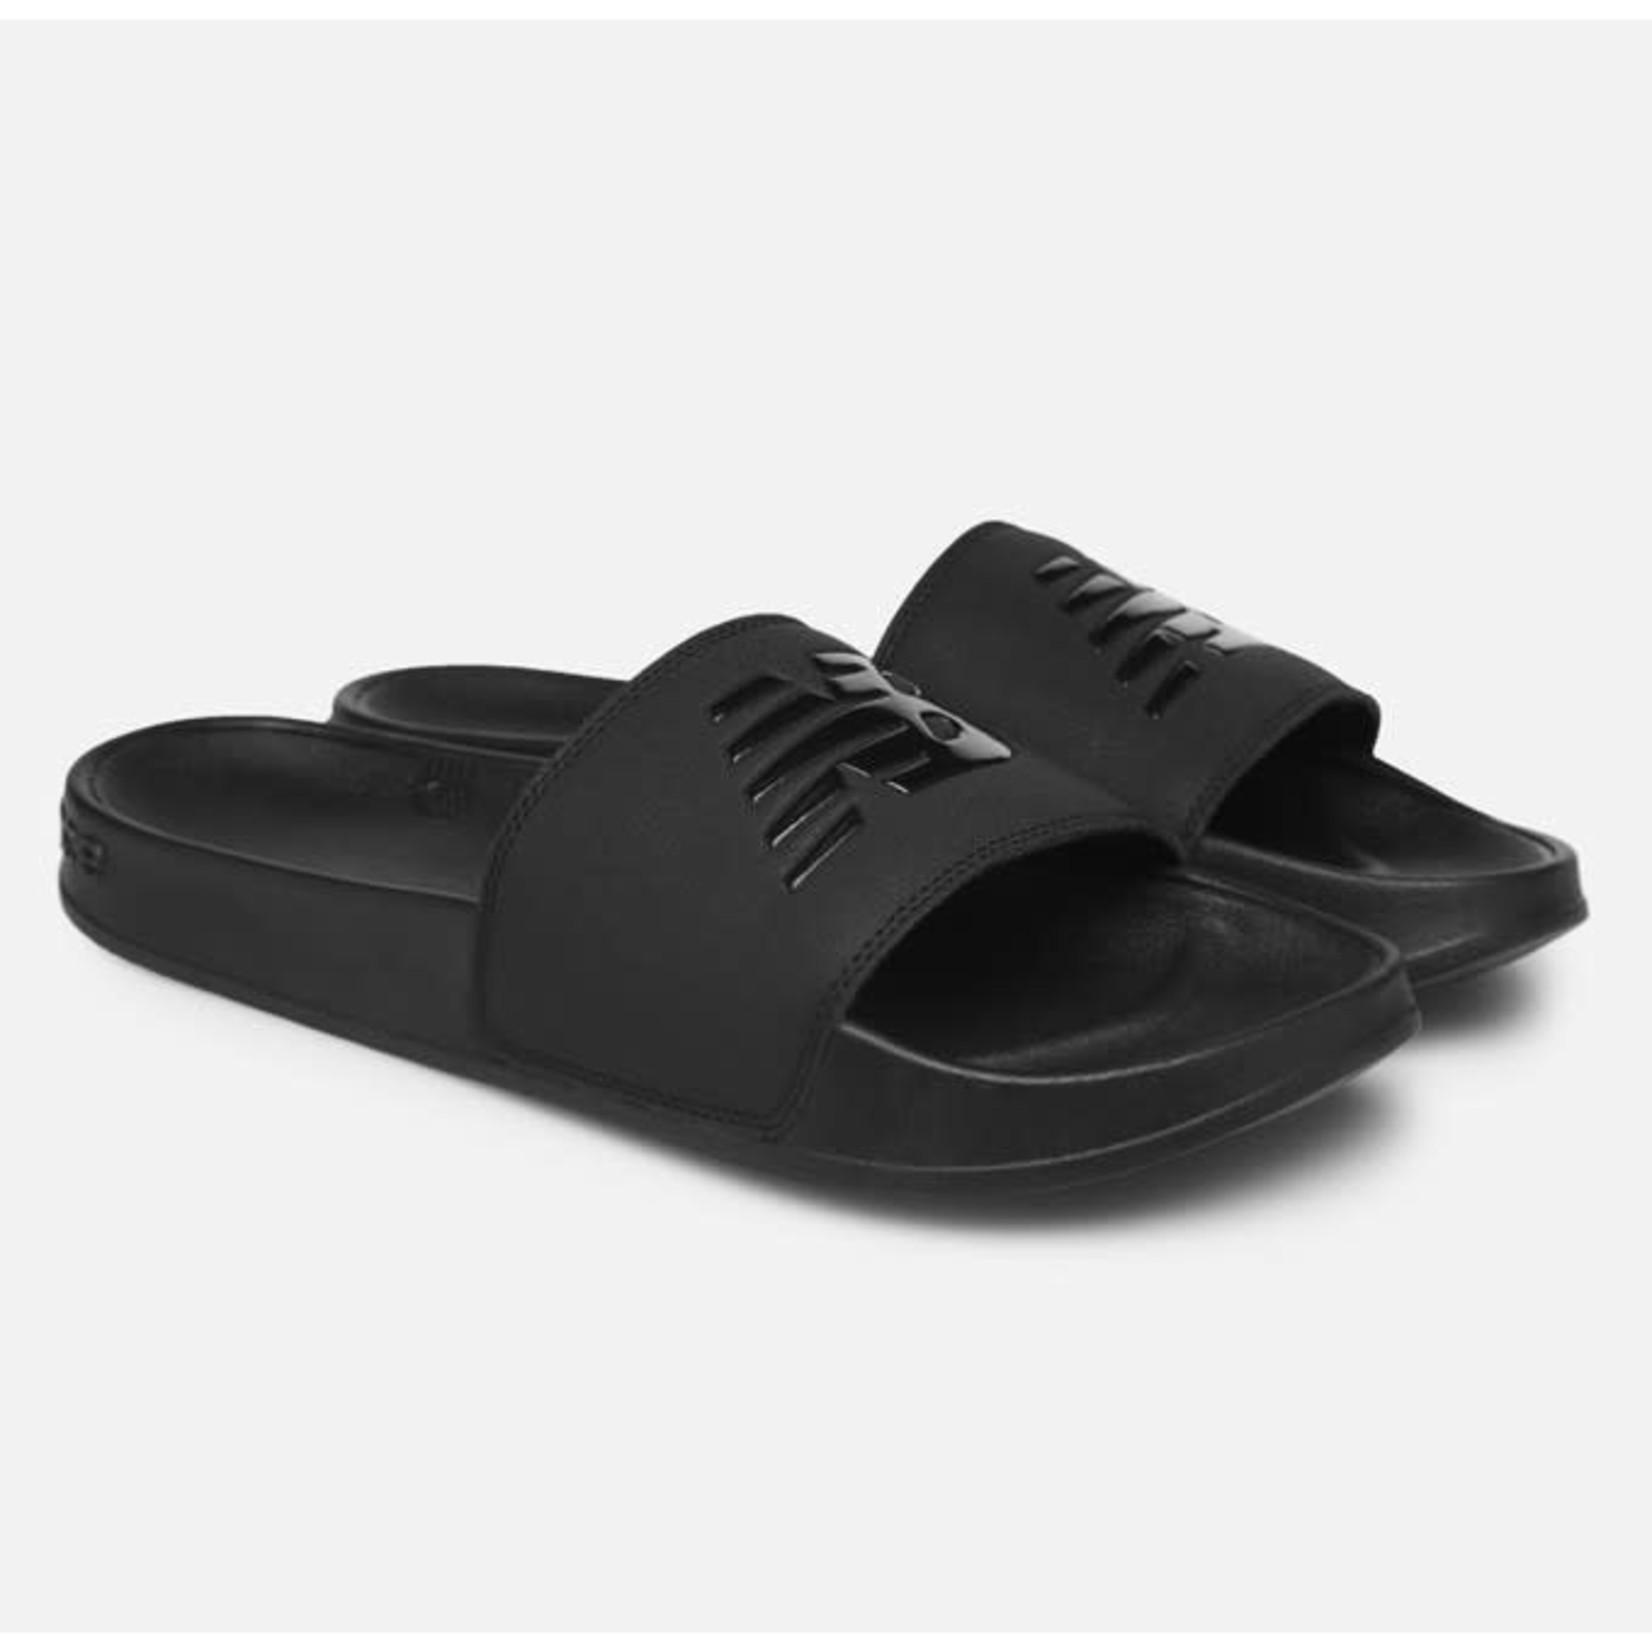 New Balance New Balance Sandals, SMF200K1, Mens